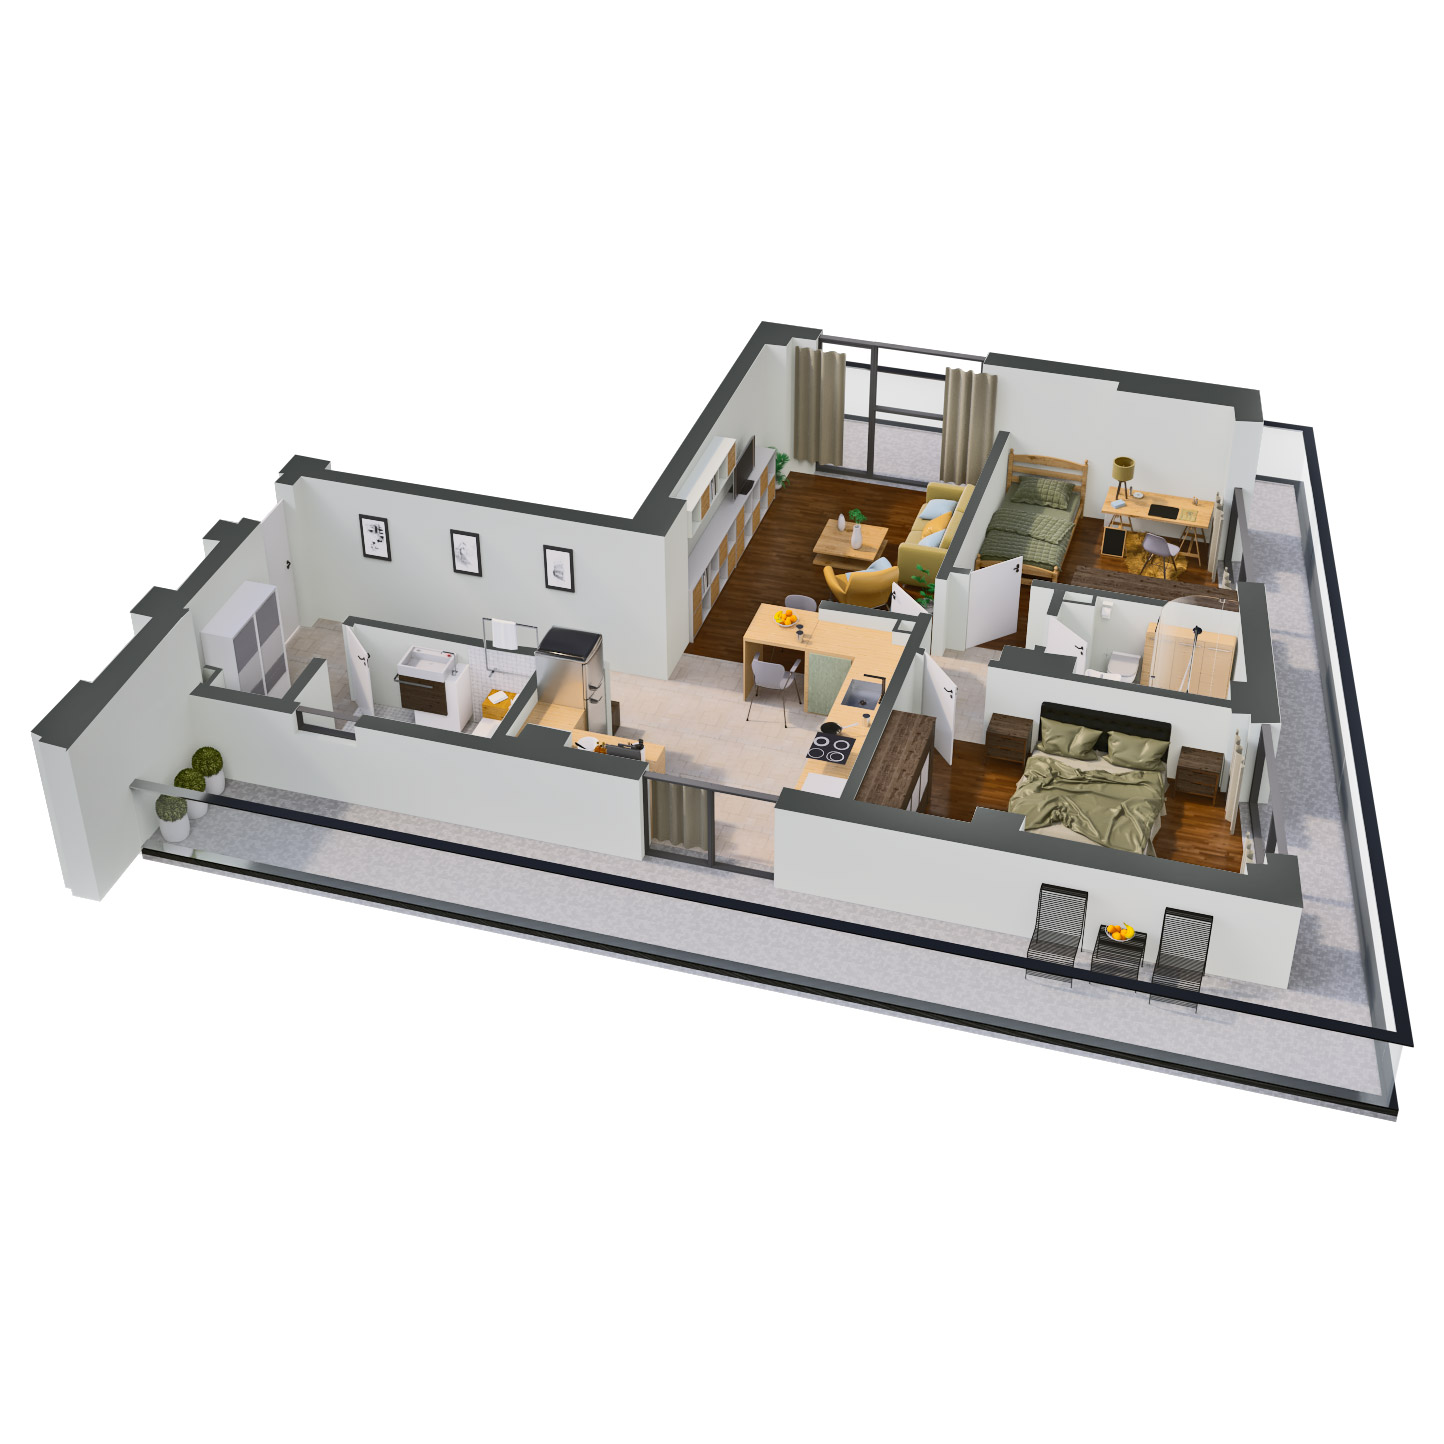 Apartament 3 camere de vanzare Bucuresti - Catedral Residence - Marriott, Piata Unirii, 13 Septembrie, Izvor - Tip 1 - T1 - D